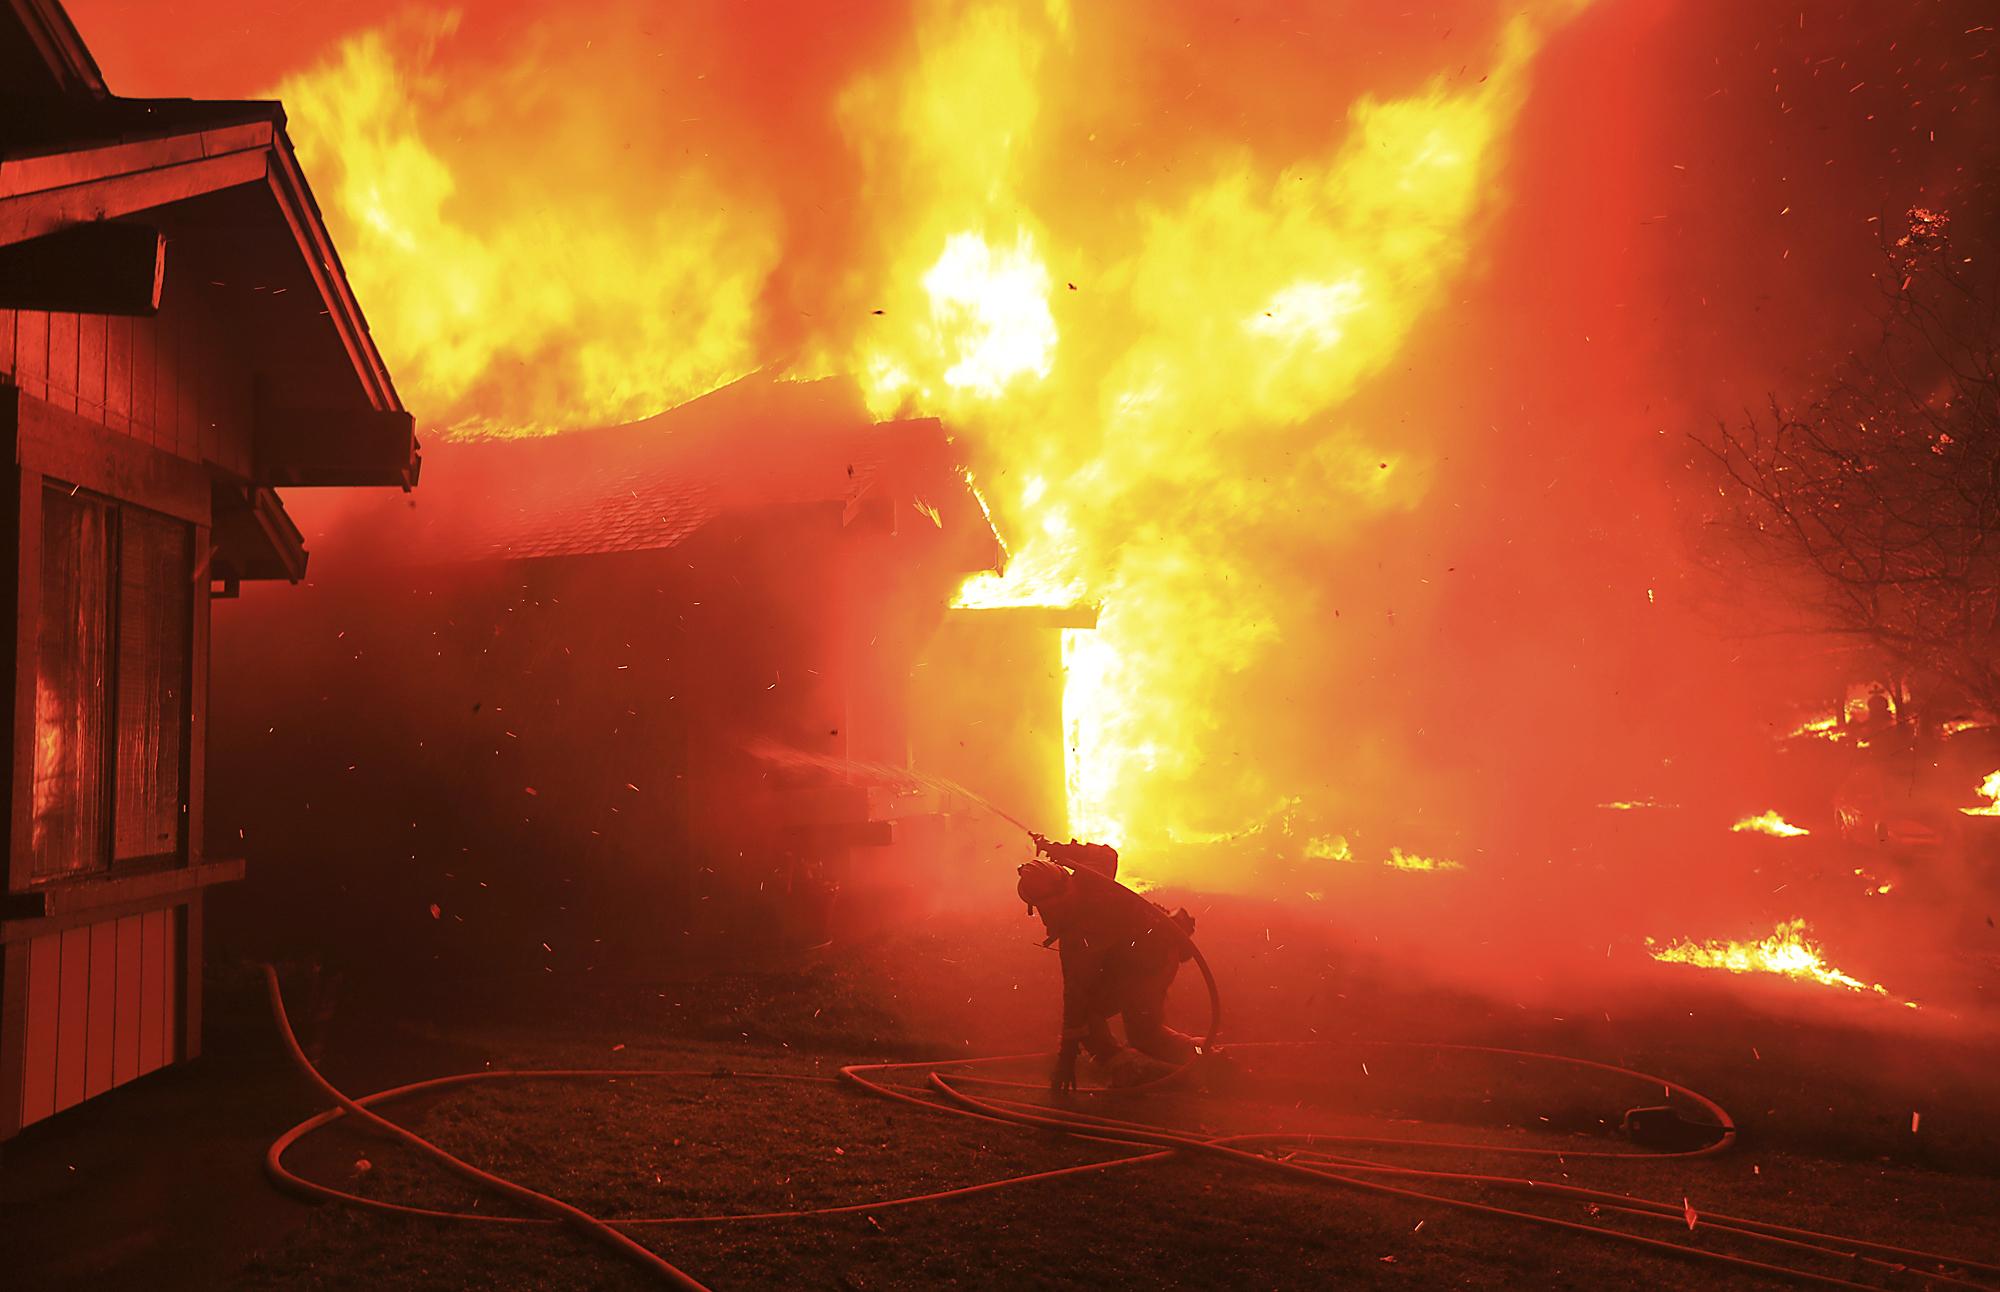 California_Wildfires_Utilities_88306-159532.jpg45892290